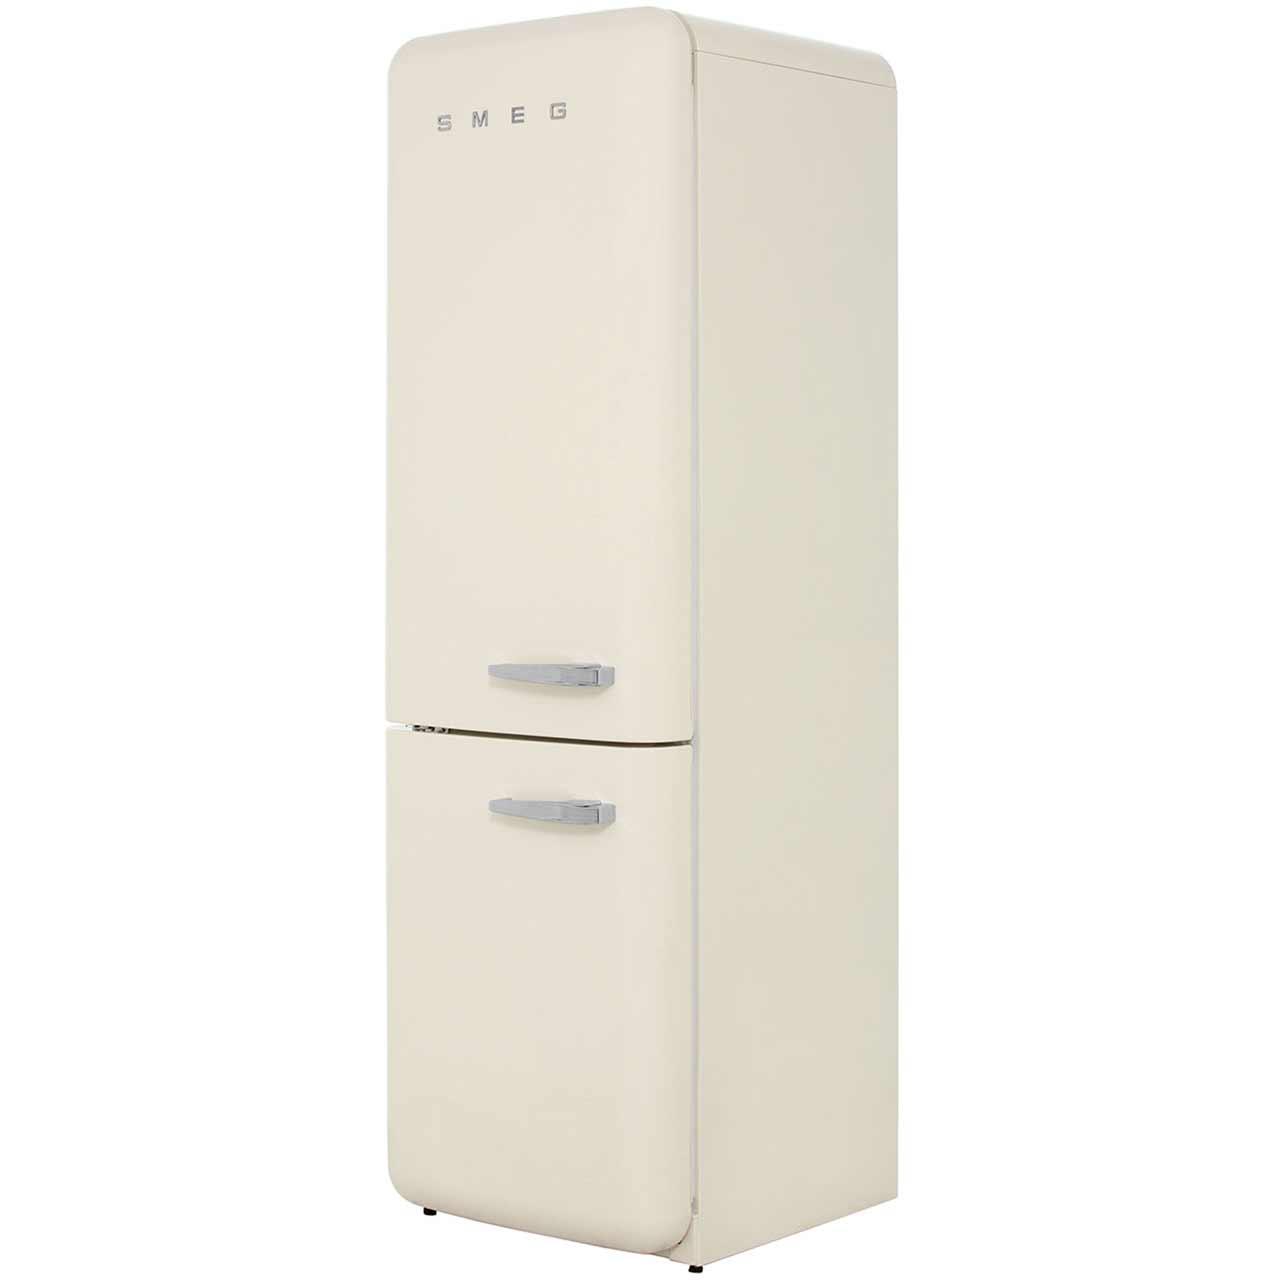 Smeg Left Hand Hinge FAB32LNC Free Standing Fridge Freezer Frost Free in Cream